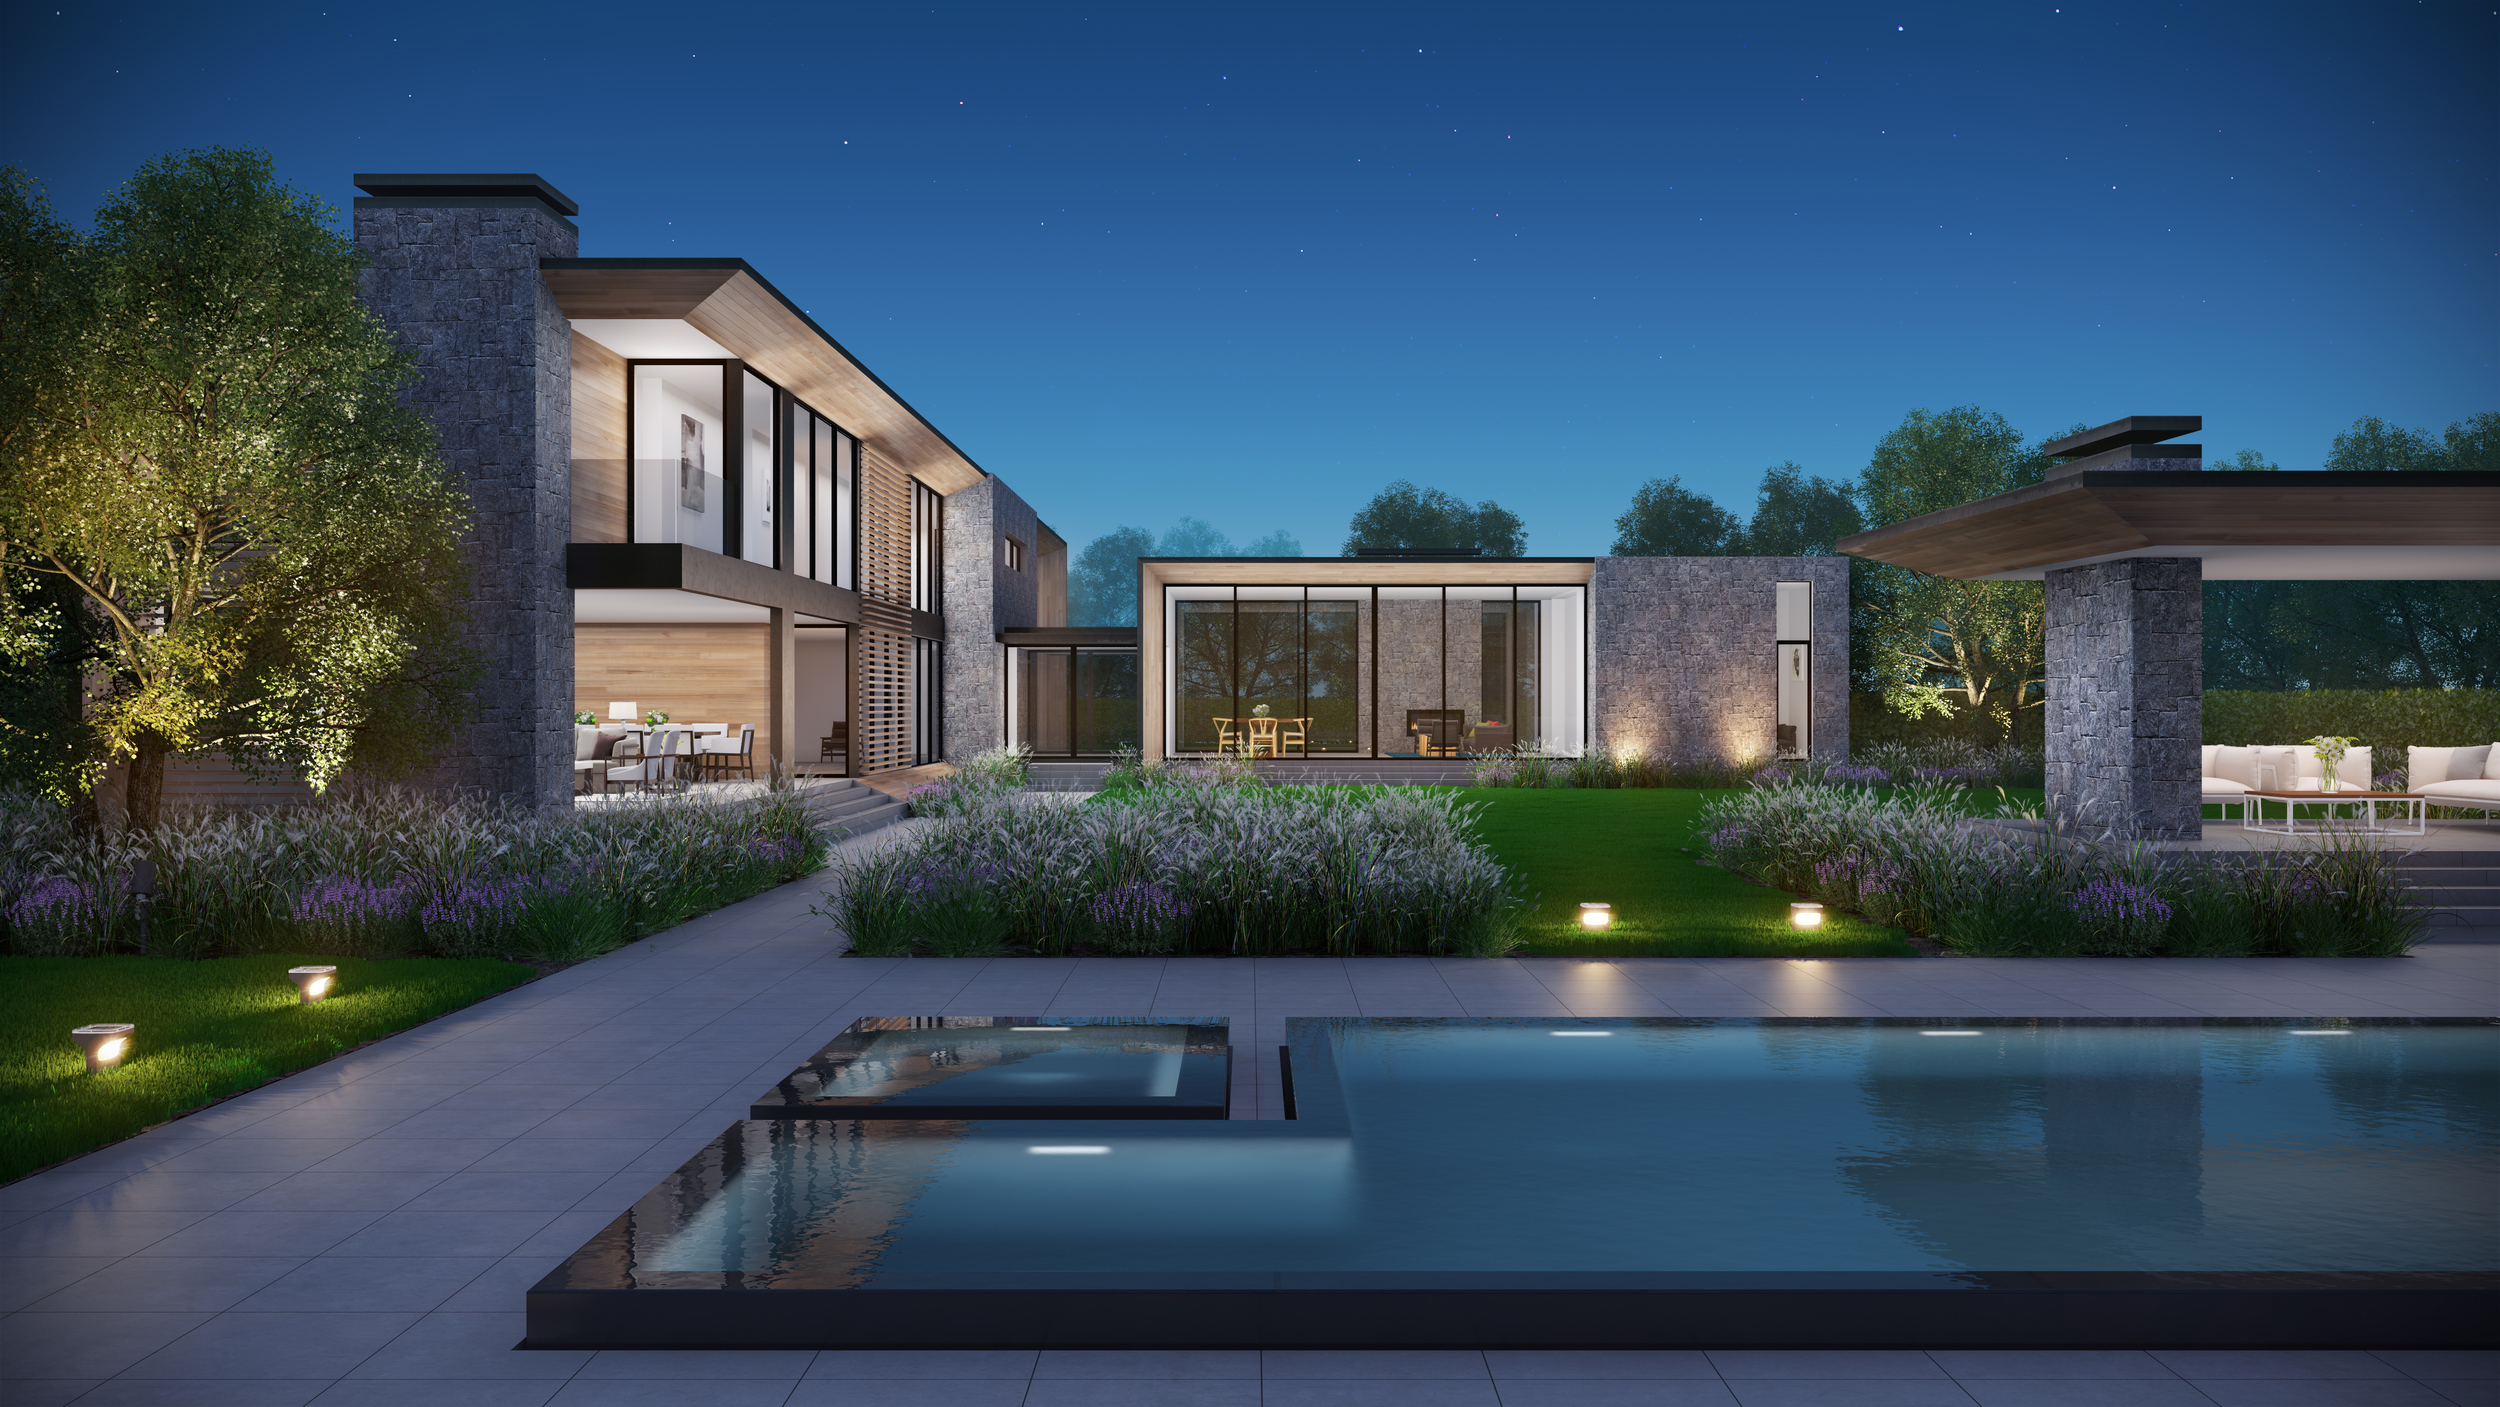 Highland Terrace II